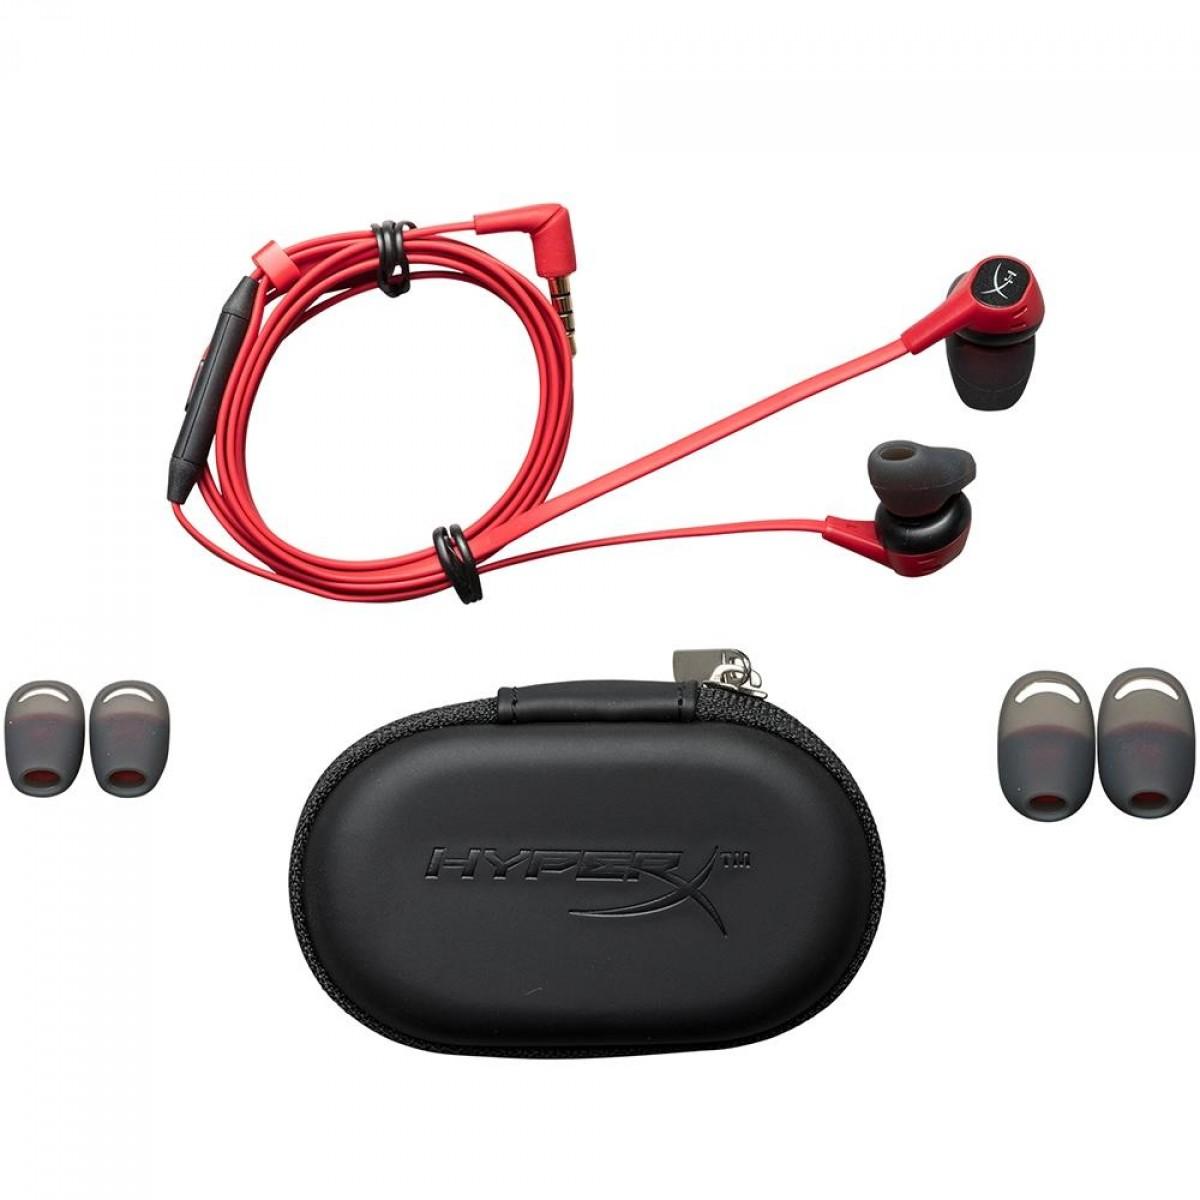 Fone de Ouvido HyperX Cloud EarBuds, Black/Red, HX-HSCEB-RD